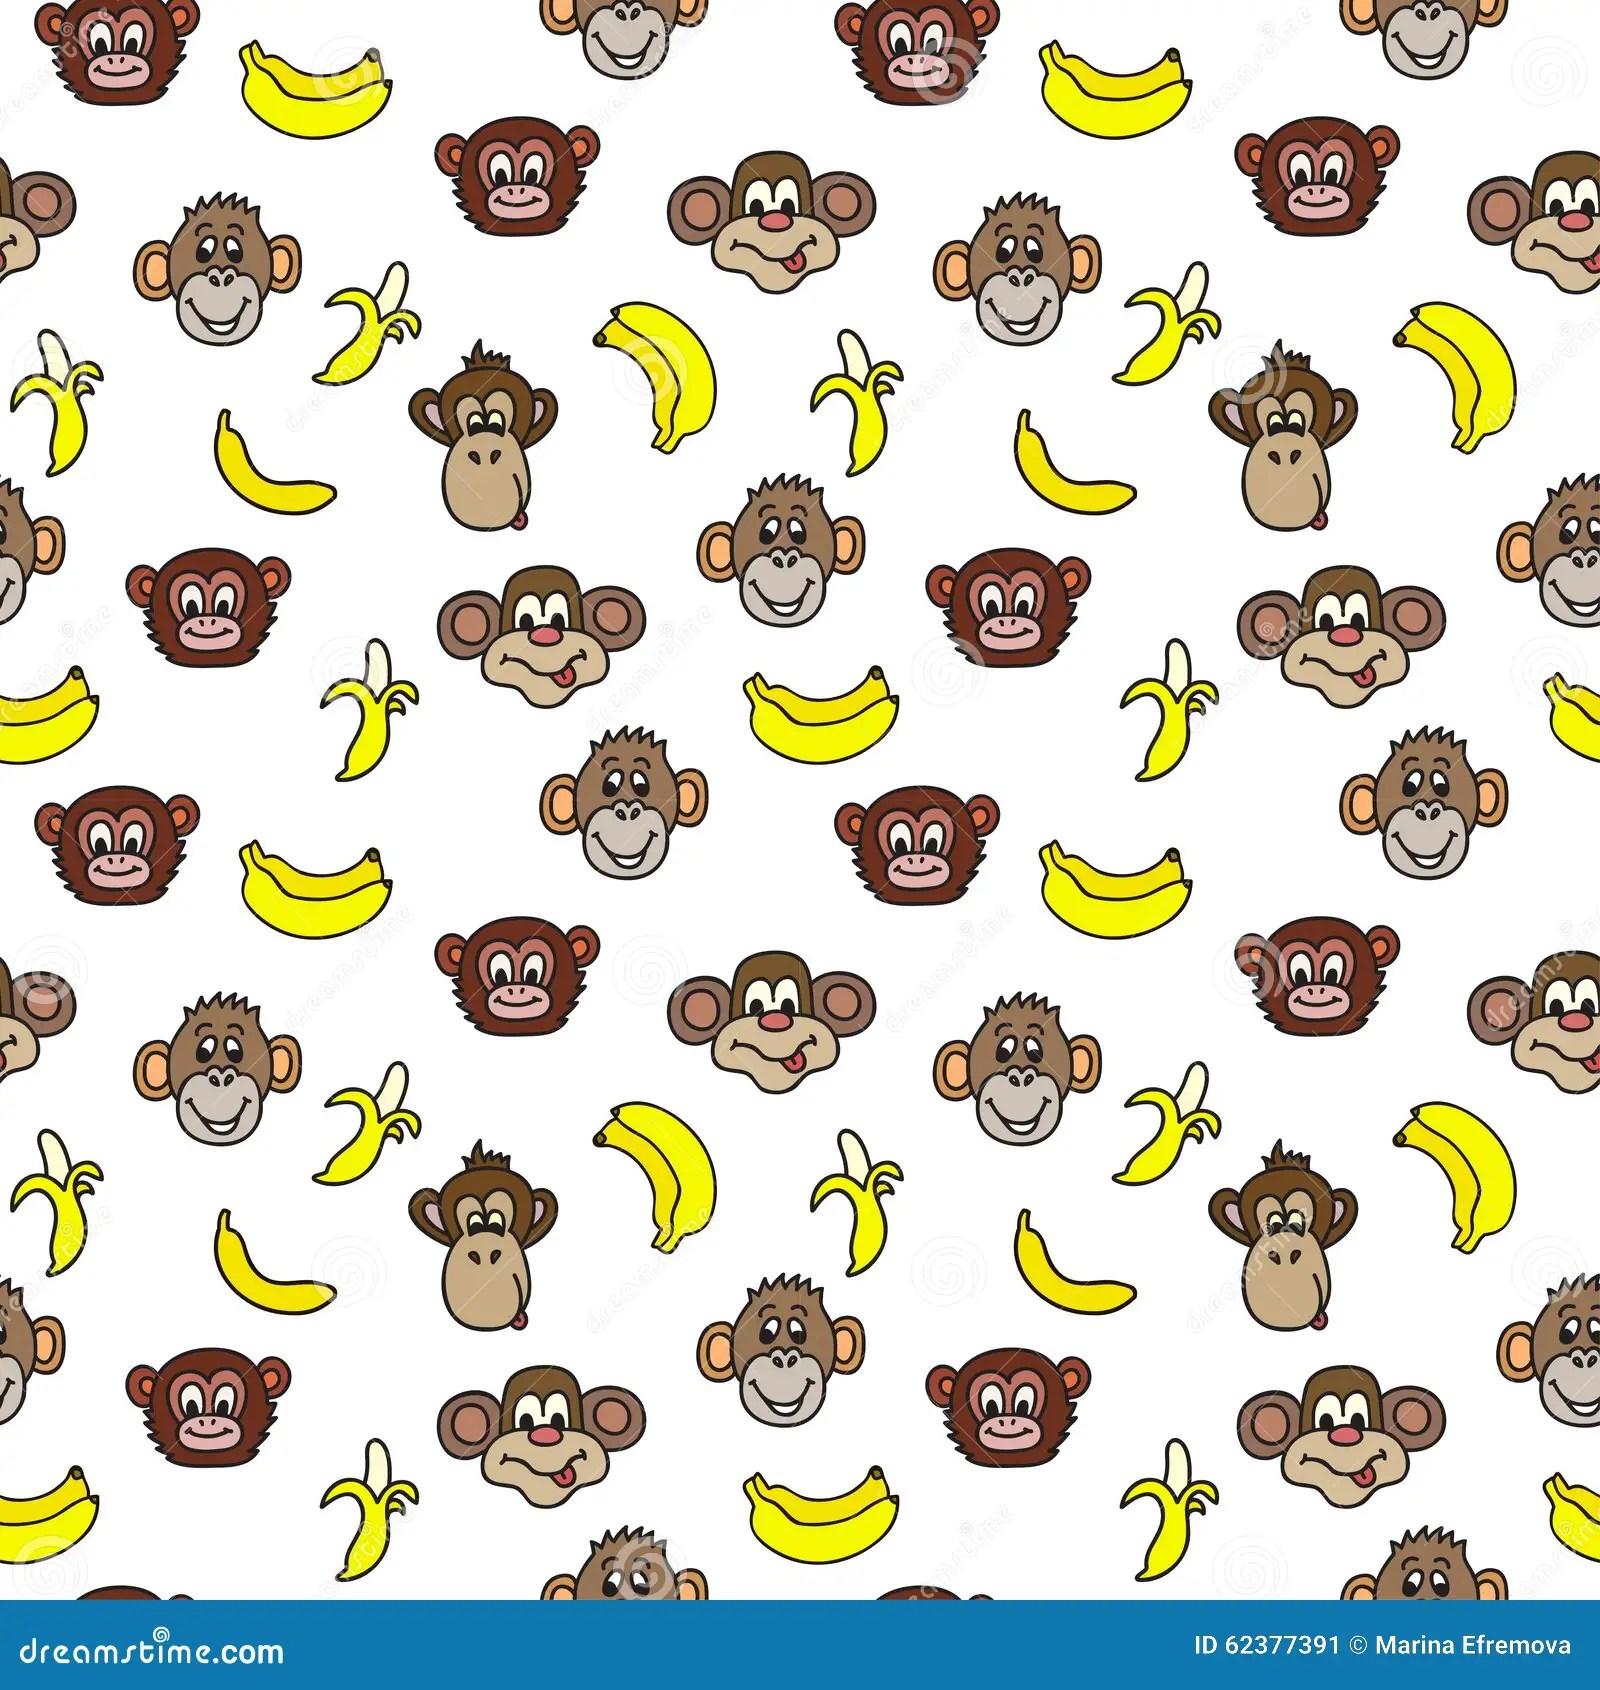 Monkeys And Bananas Cute Wallpaper Seamless Pattern With Cute Faces Of Monkeys And Bananas